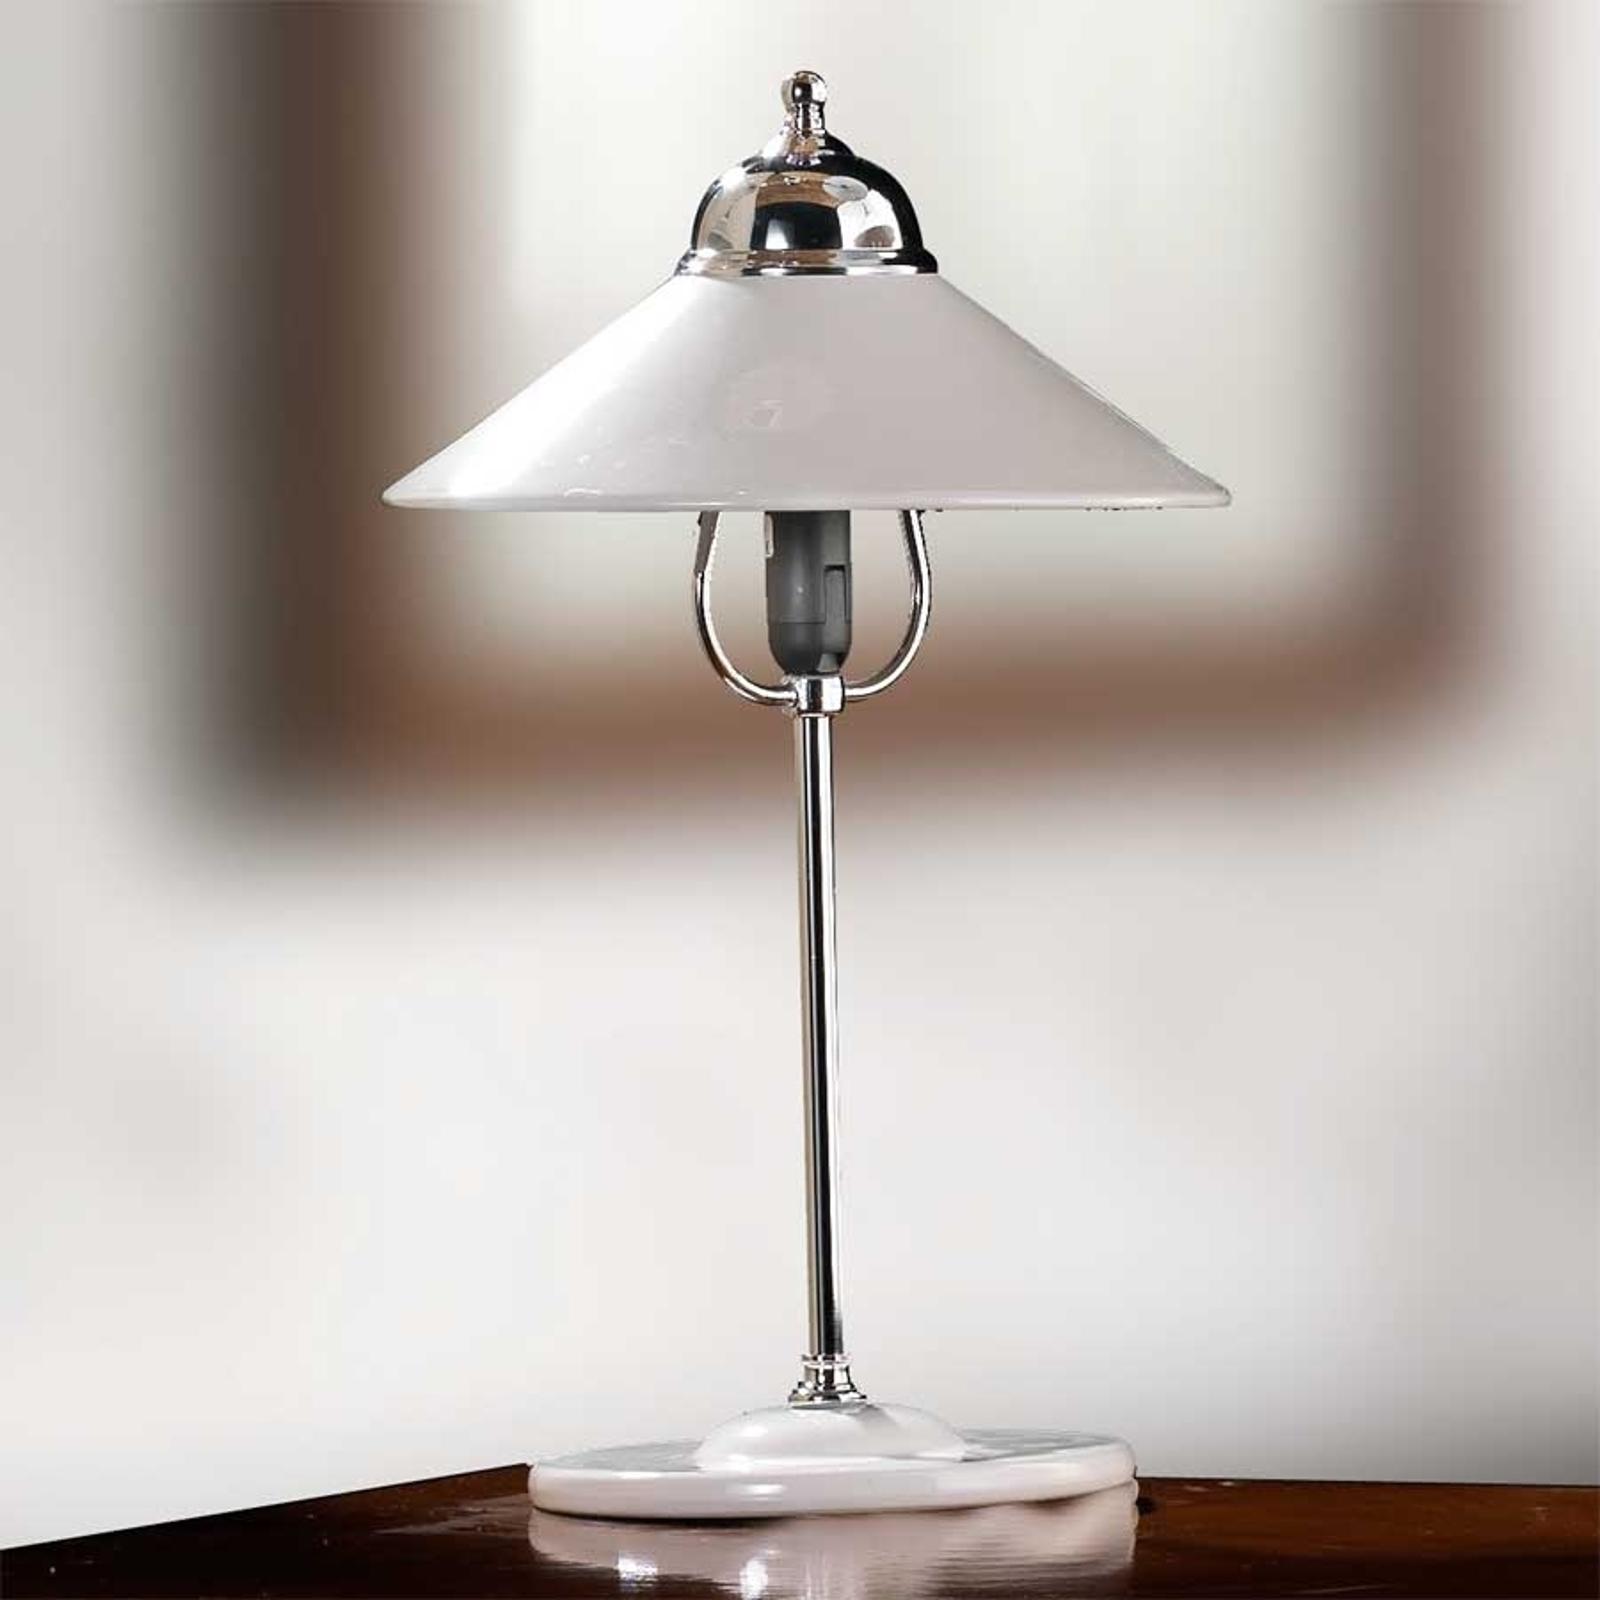 Tafellamp GIACOMO met keramieken kap